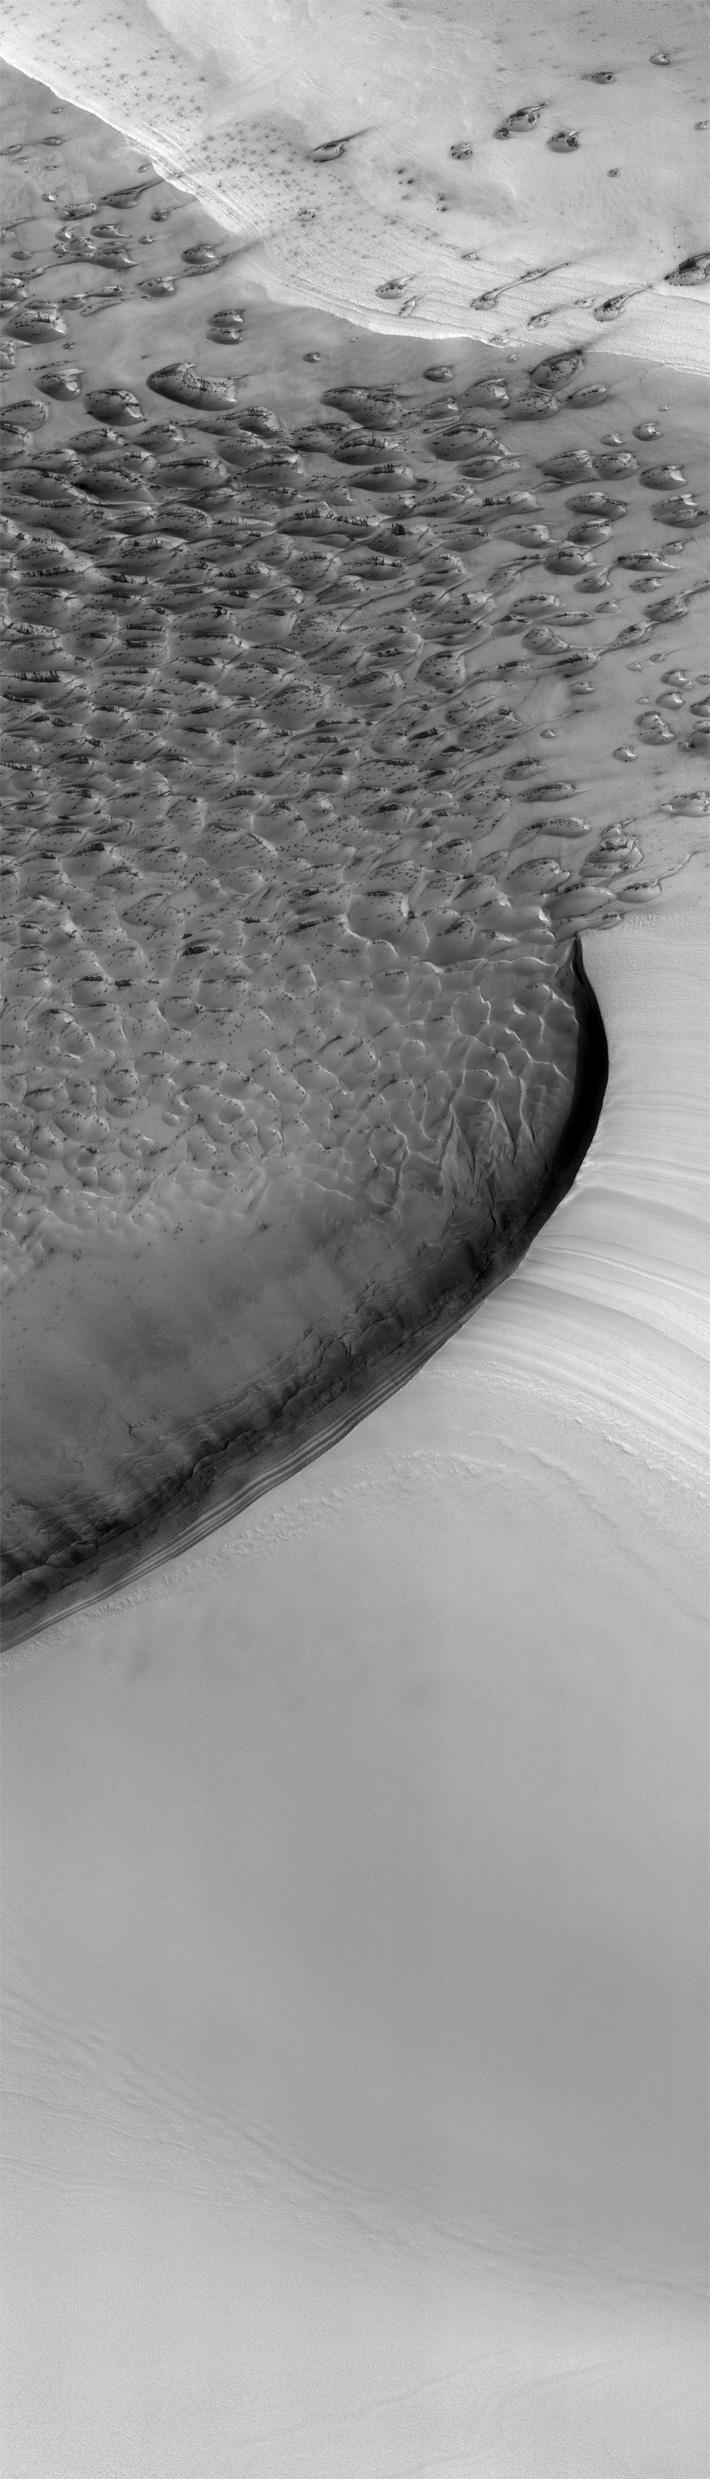 NOMAP-Mars